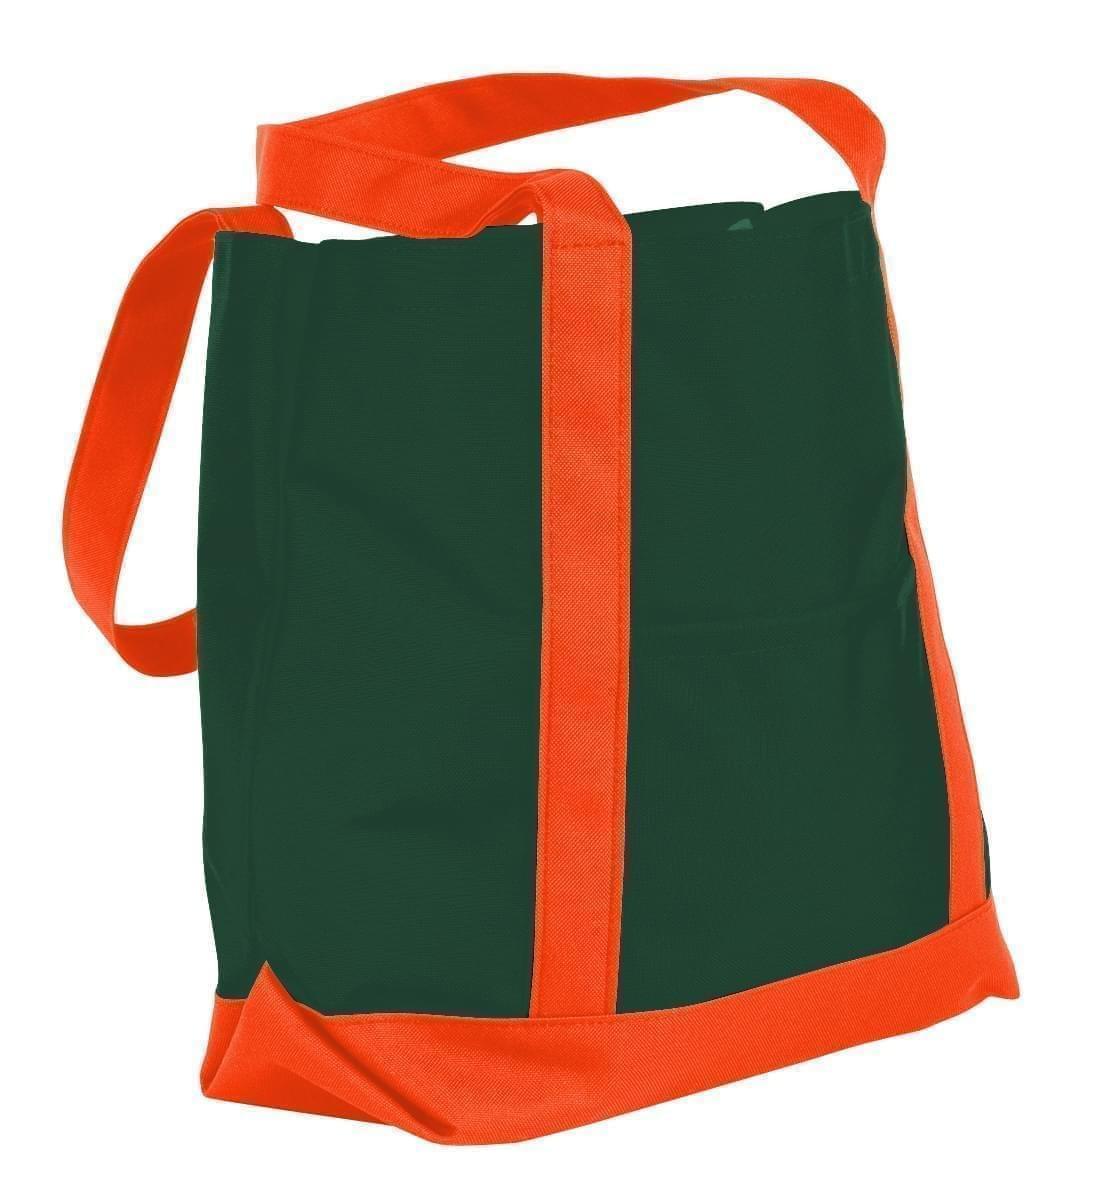 USA Made Canvas Fashion Tote Bags, Hunter Green-Orange, XAACL1UAIJ